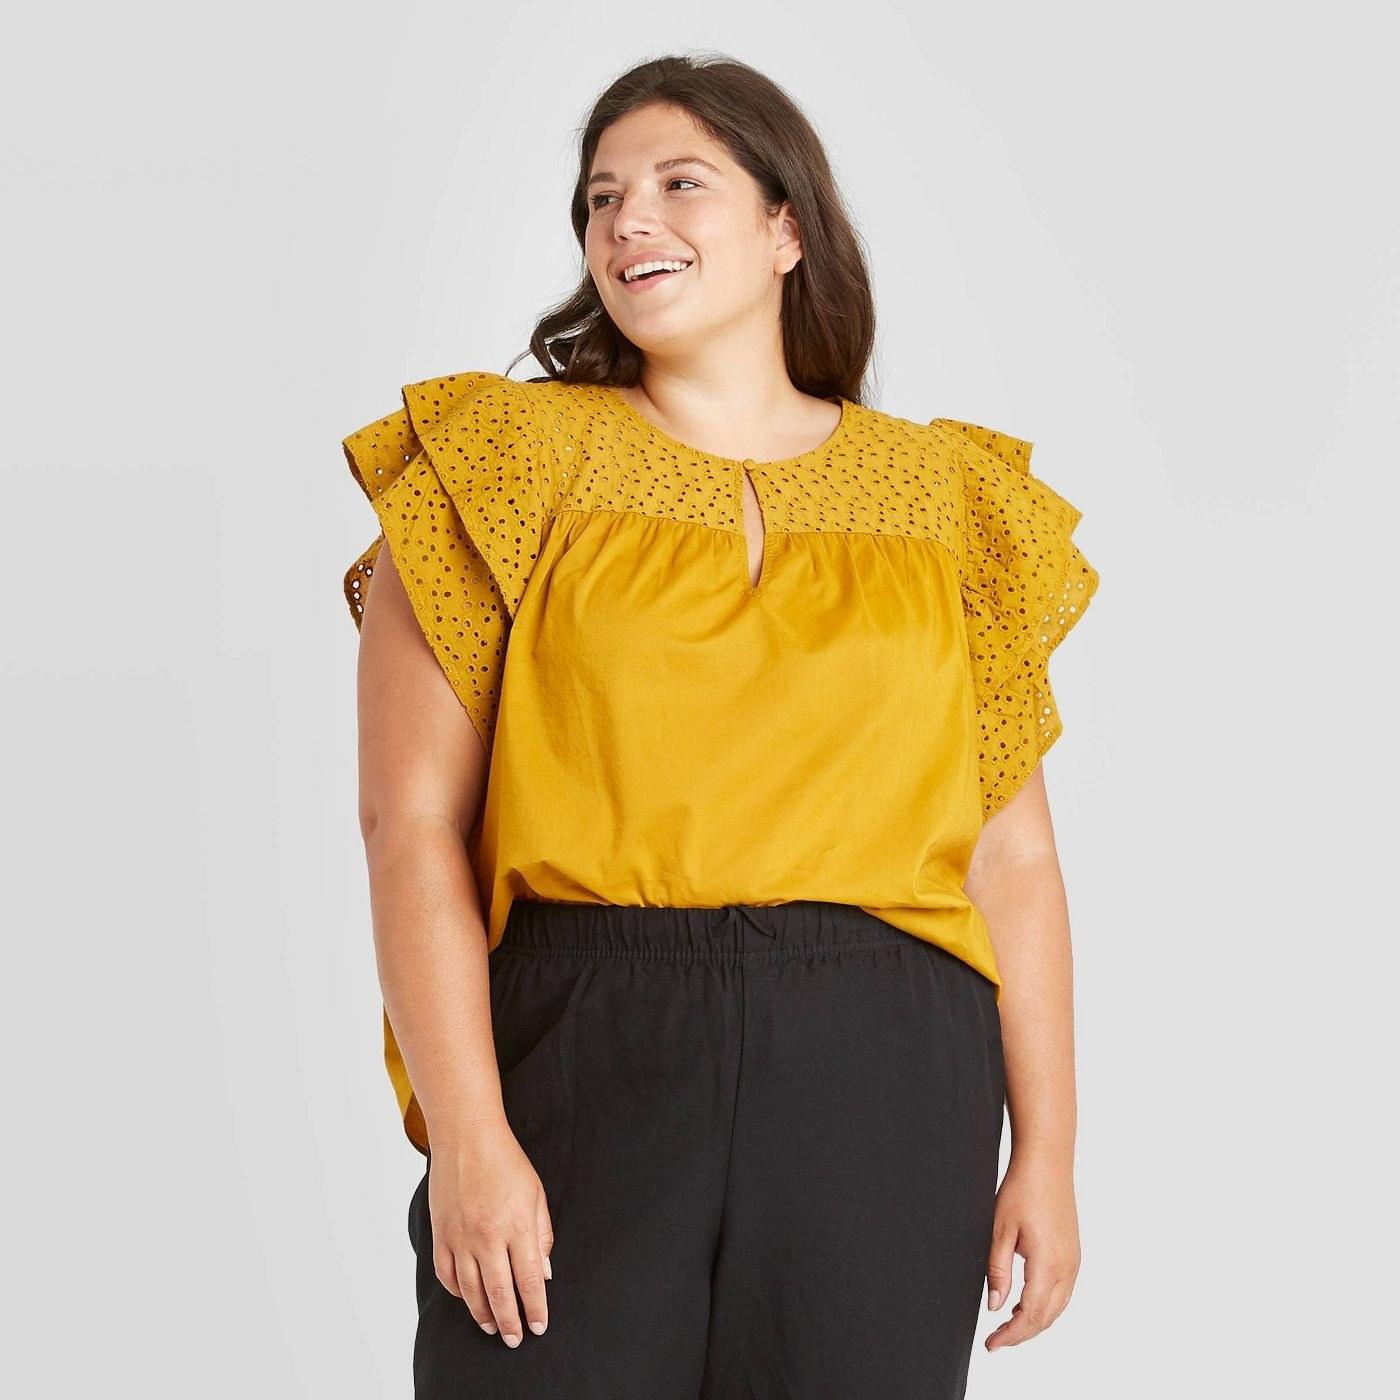 Model wearing yellow top